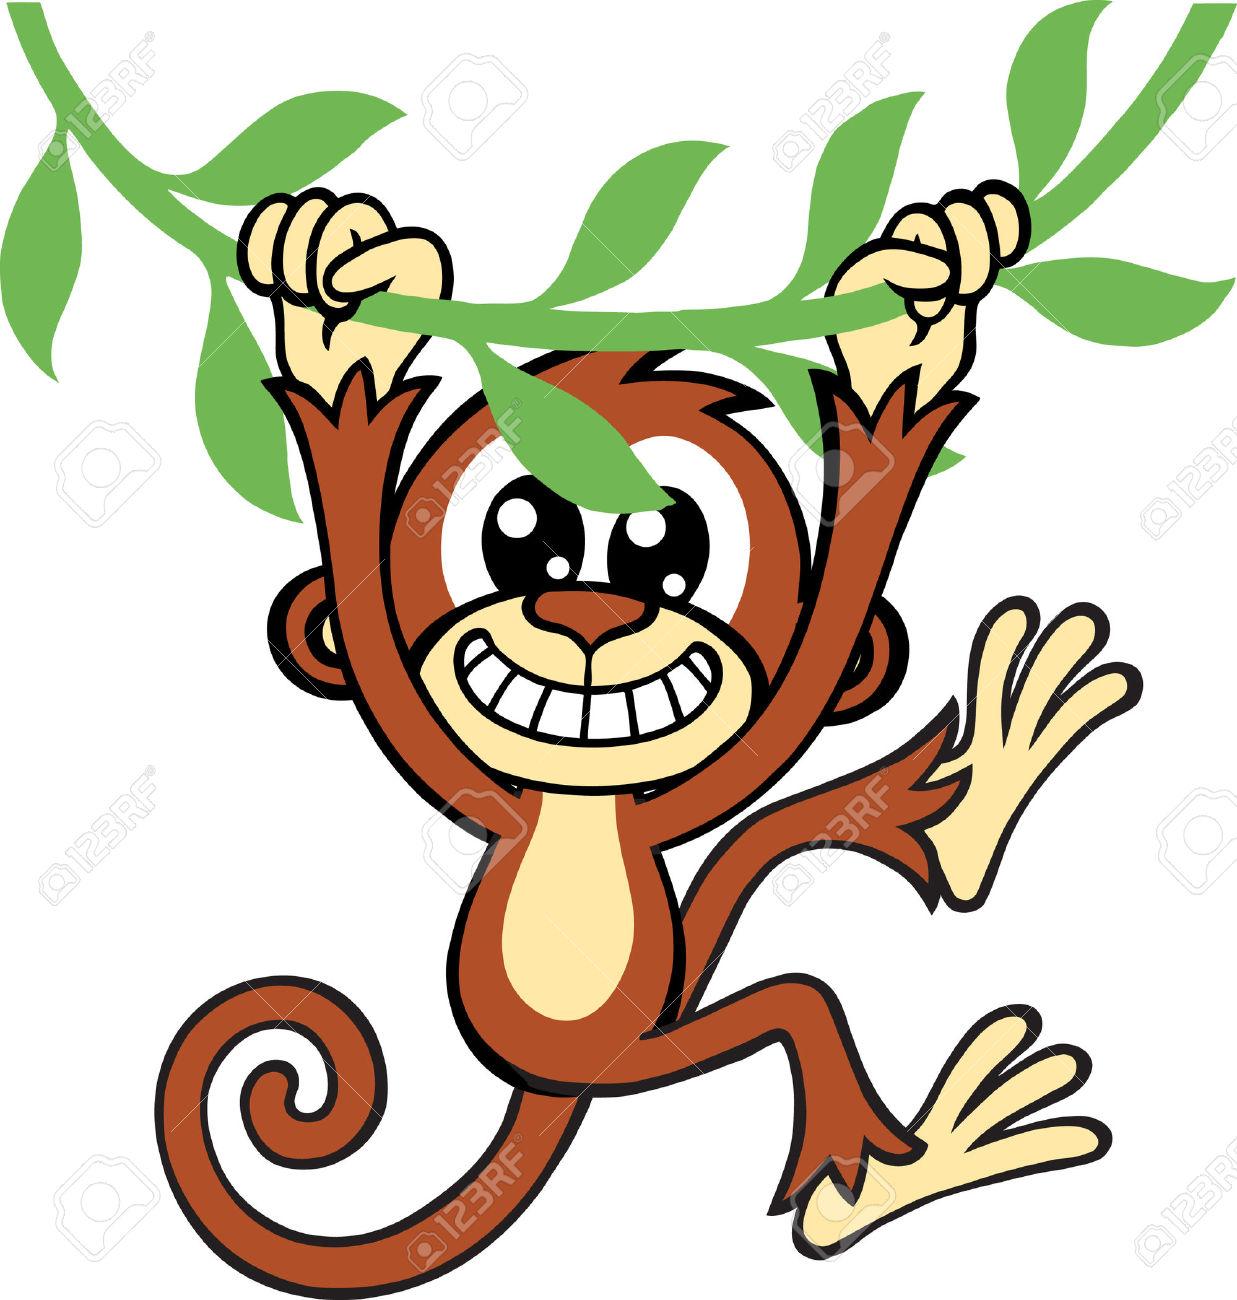 mono clipart clipground Five Little Monkeys Monkey Theme Clip Art